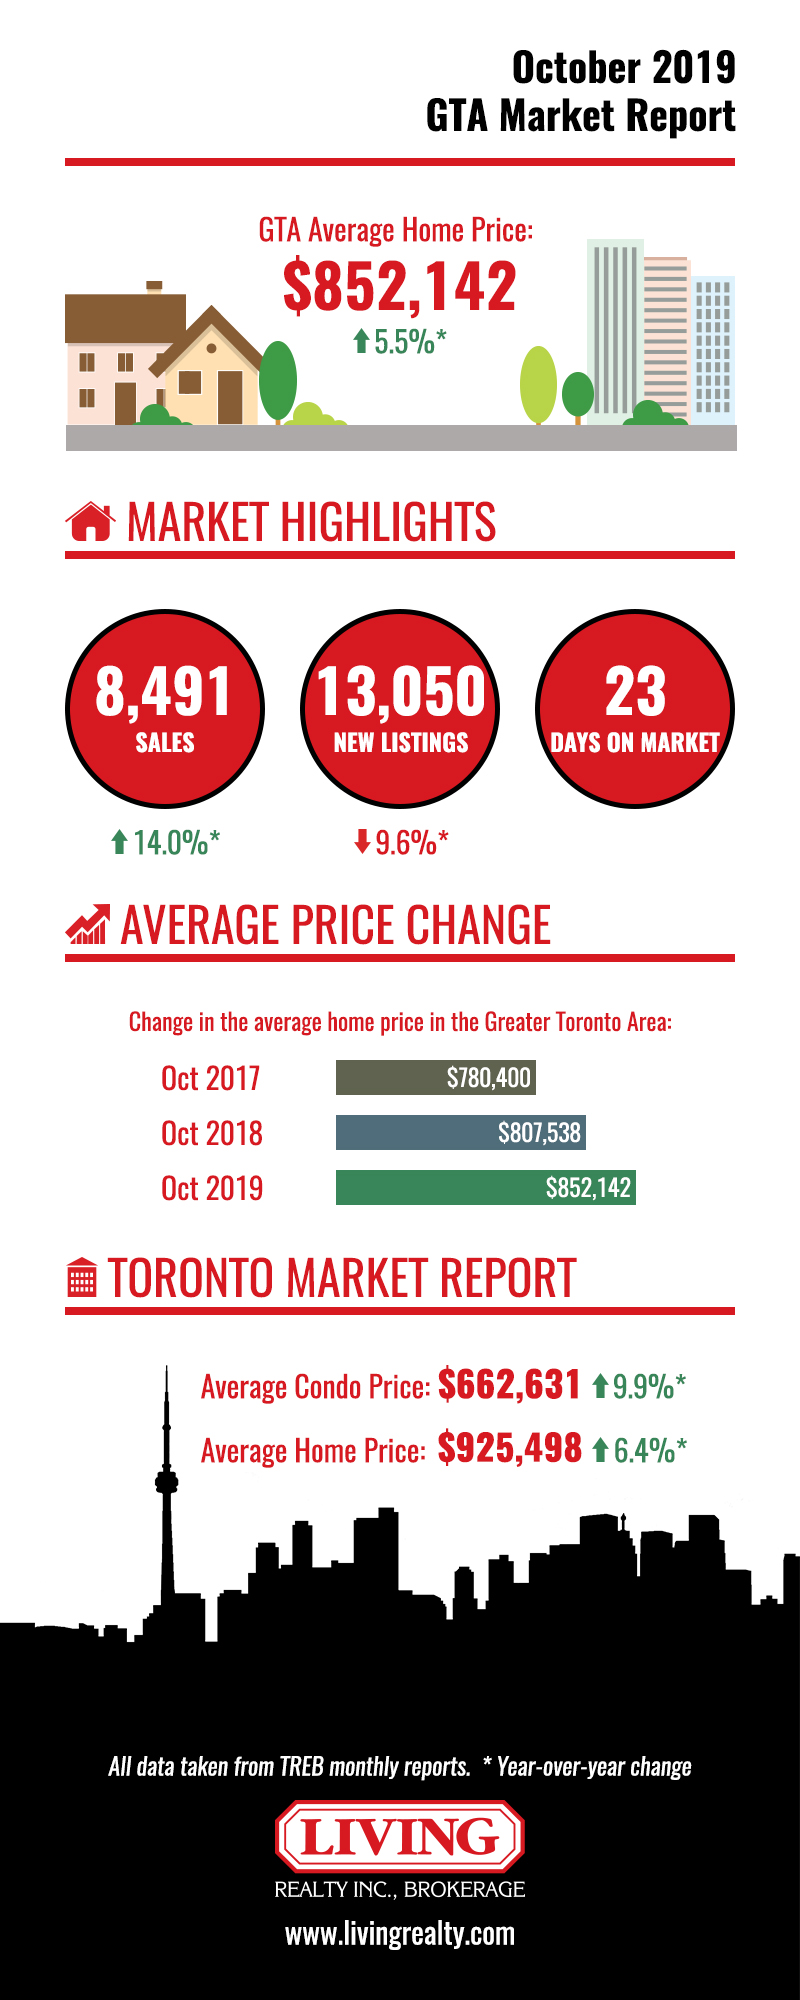 October 2019 GTA Market Report